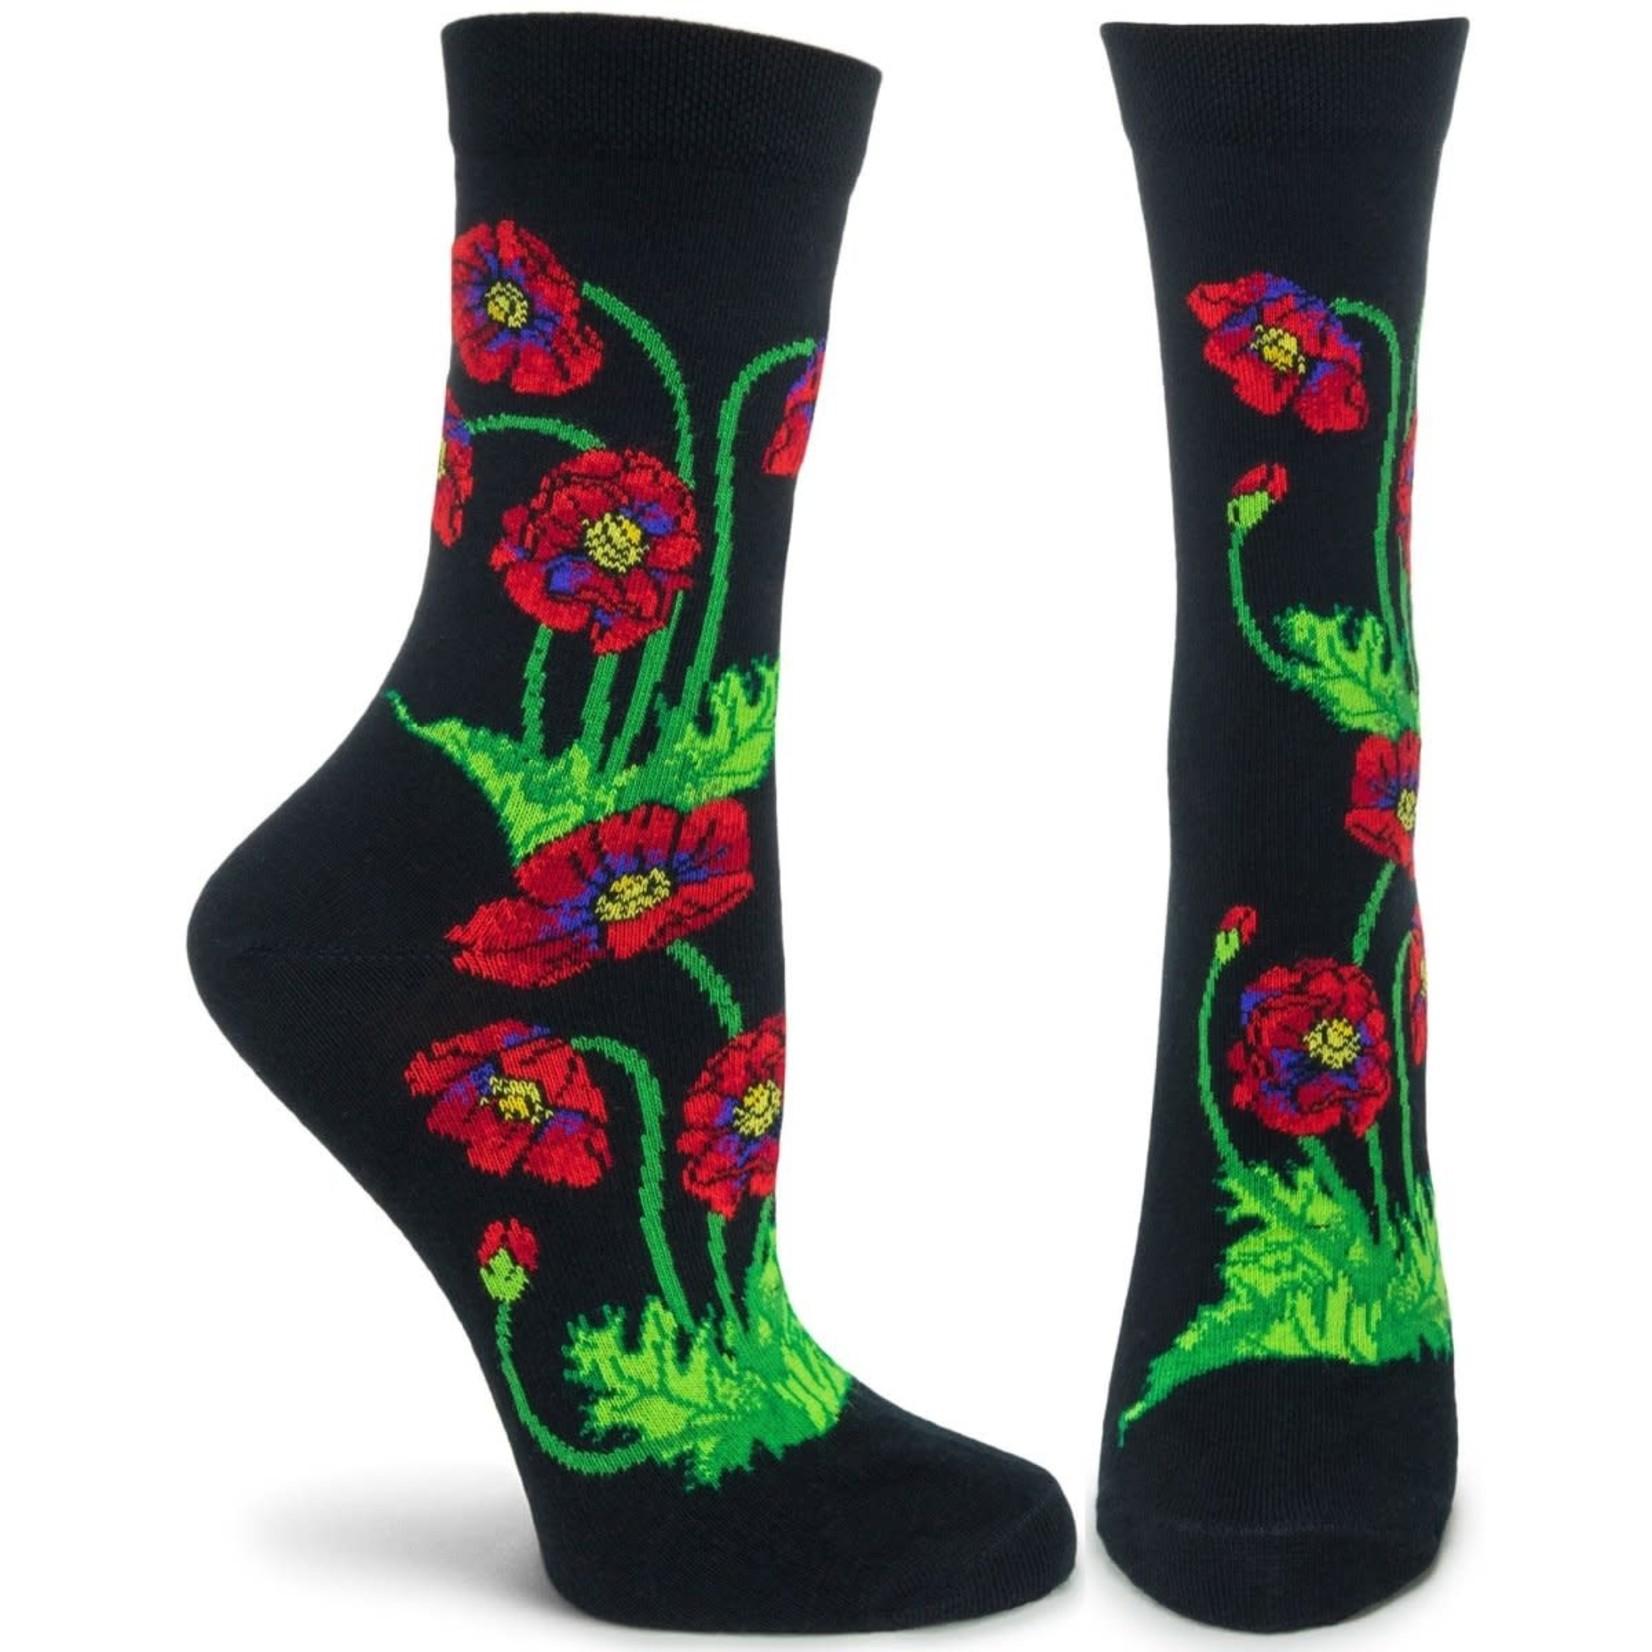 Ozone Socks Apothecary Floral Poppies Socks in Black